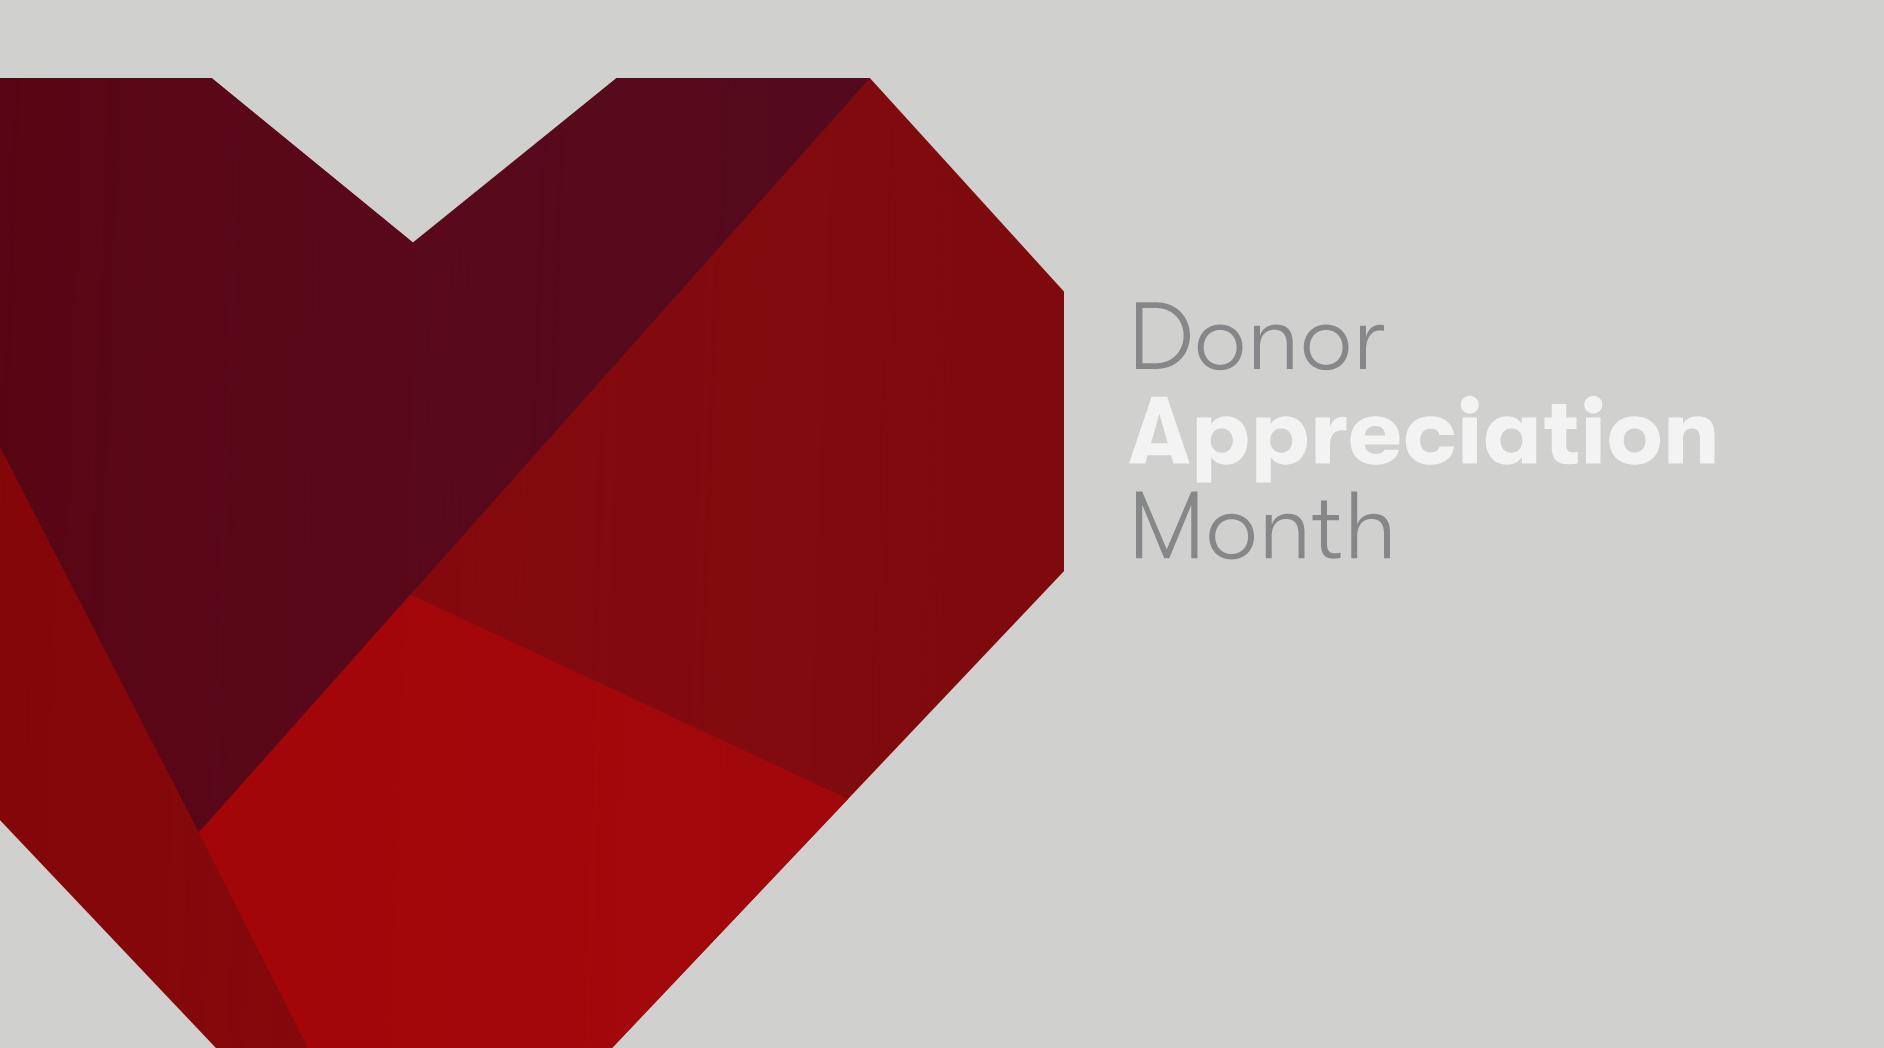 Donor Appreciation Month